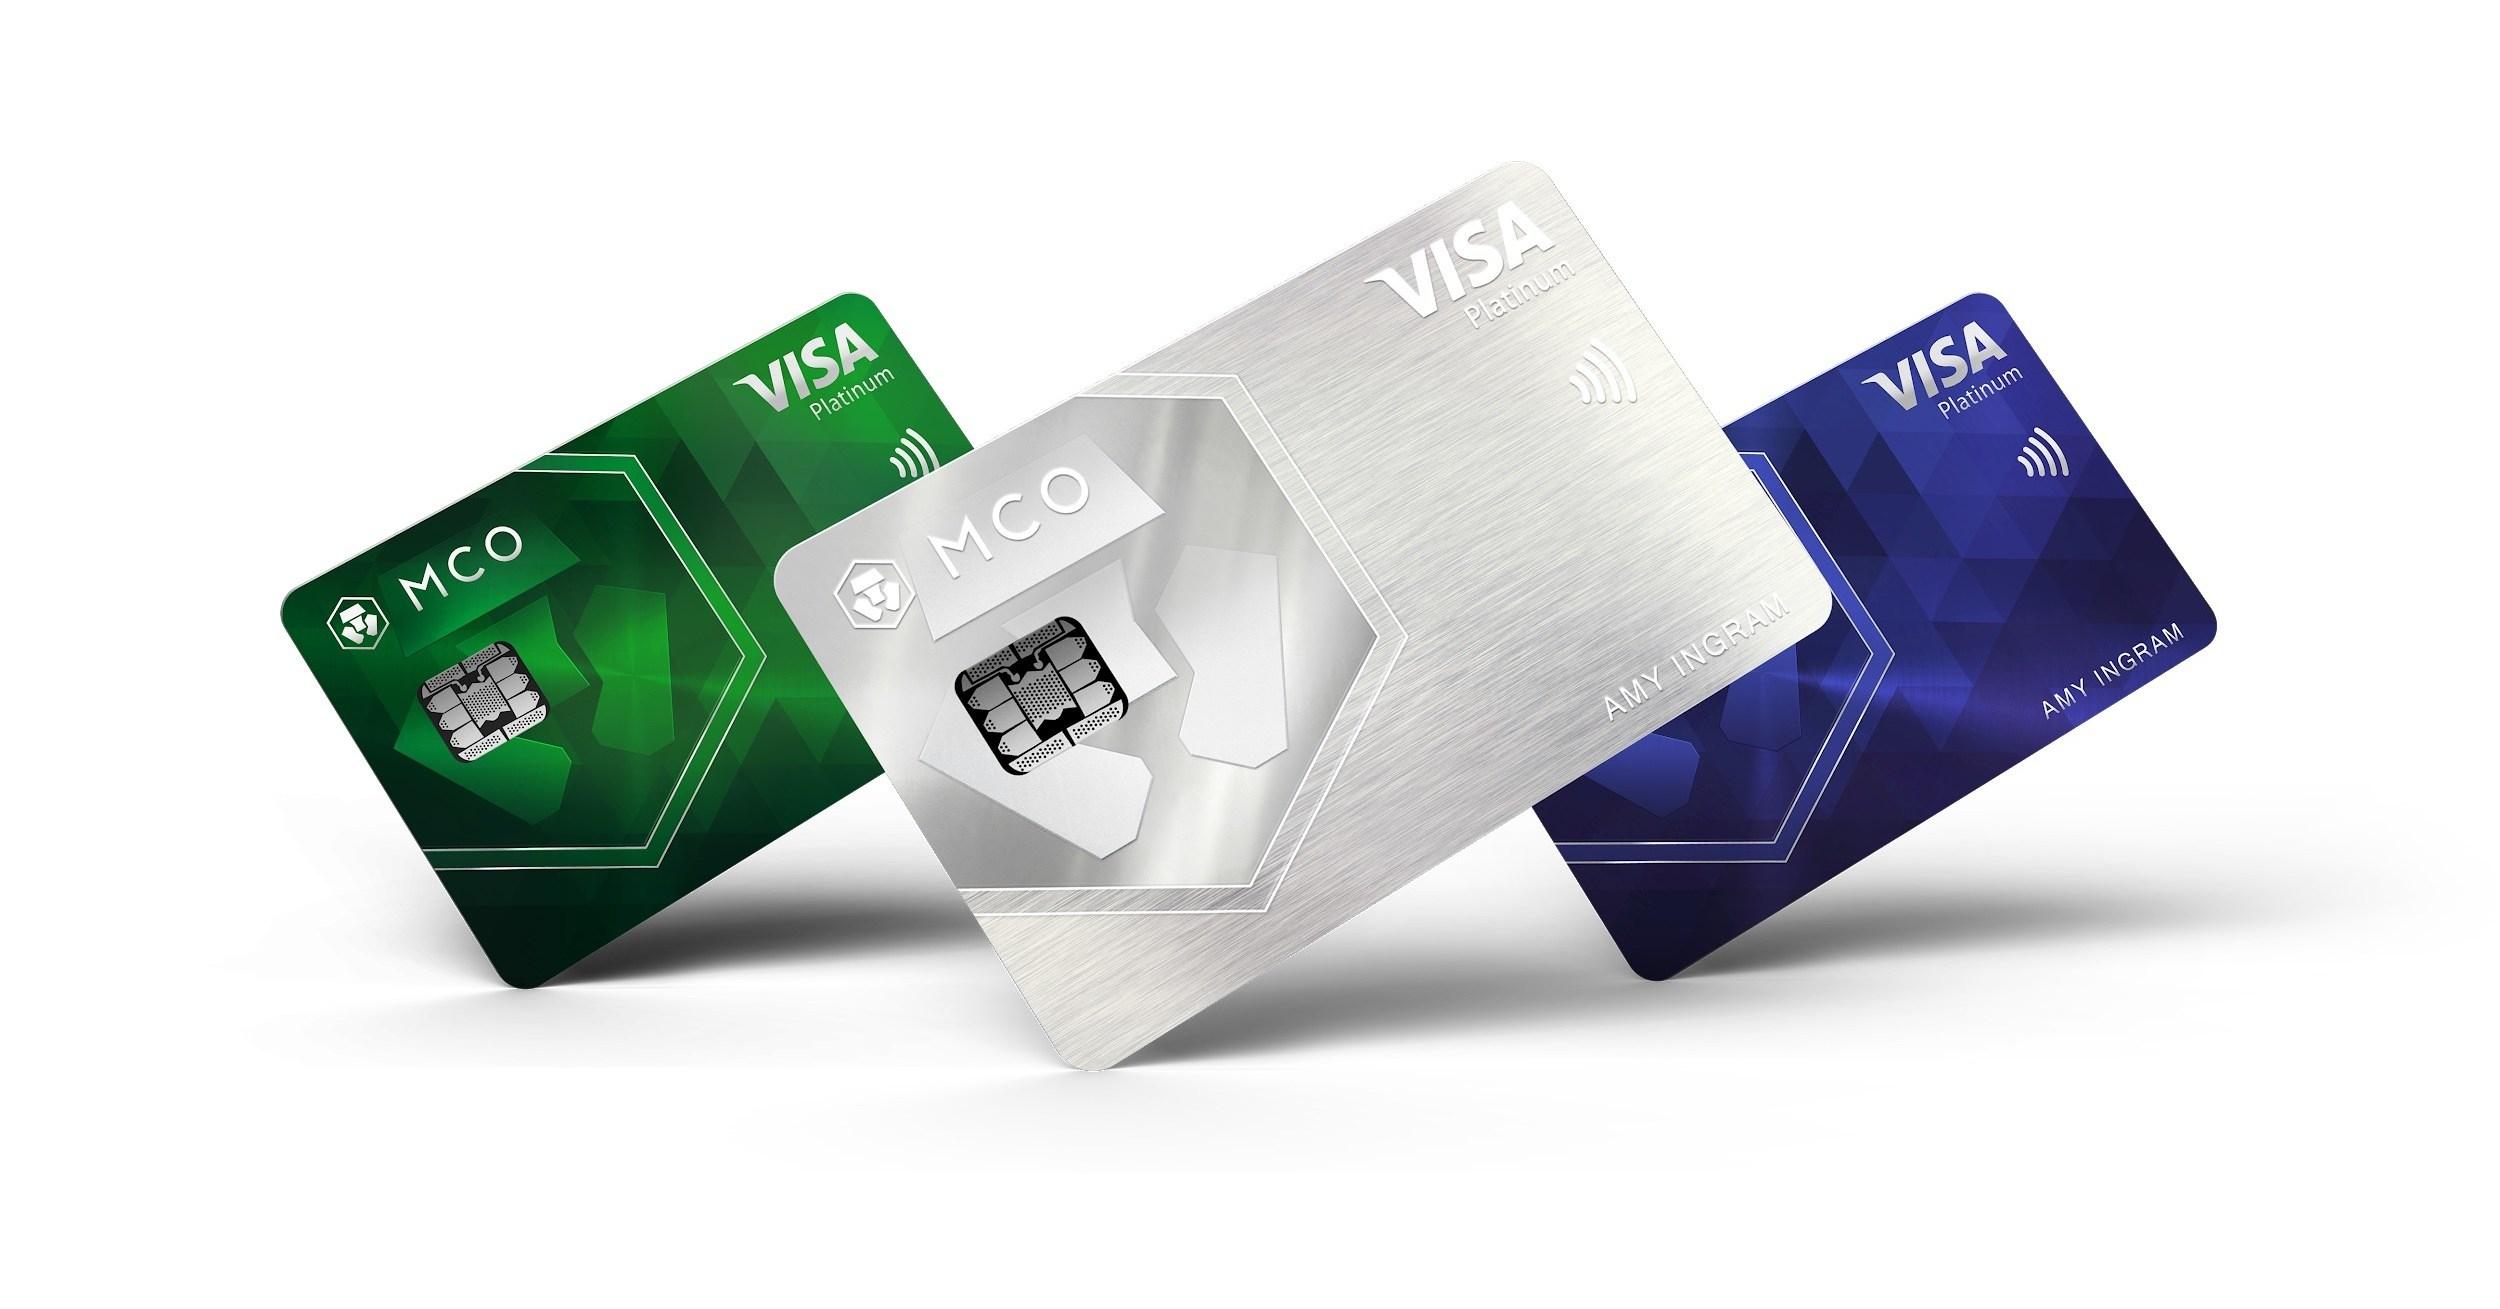 Crypto (MCO VISA Card)